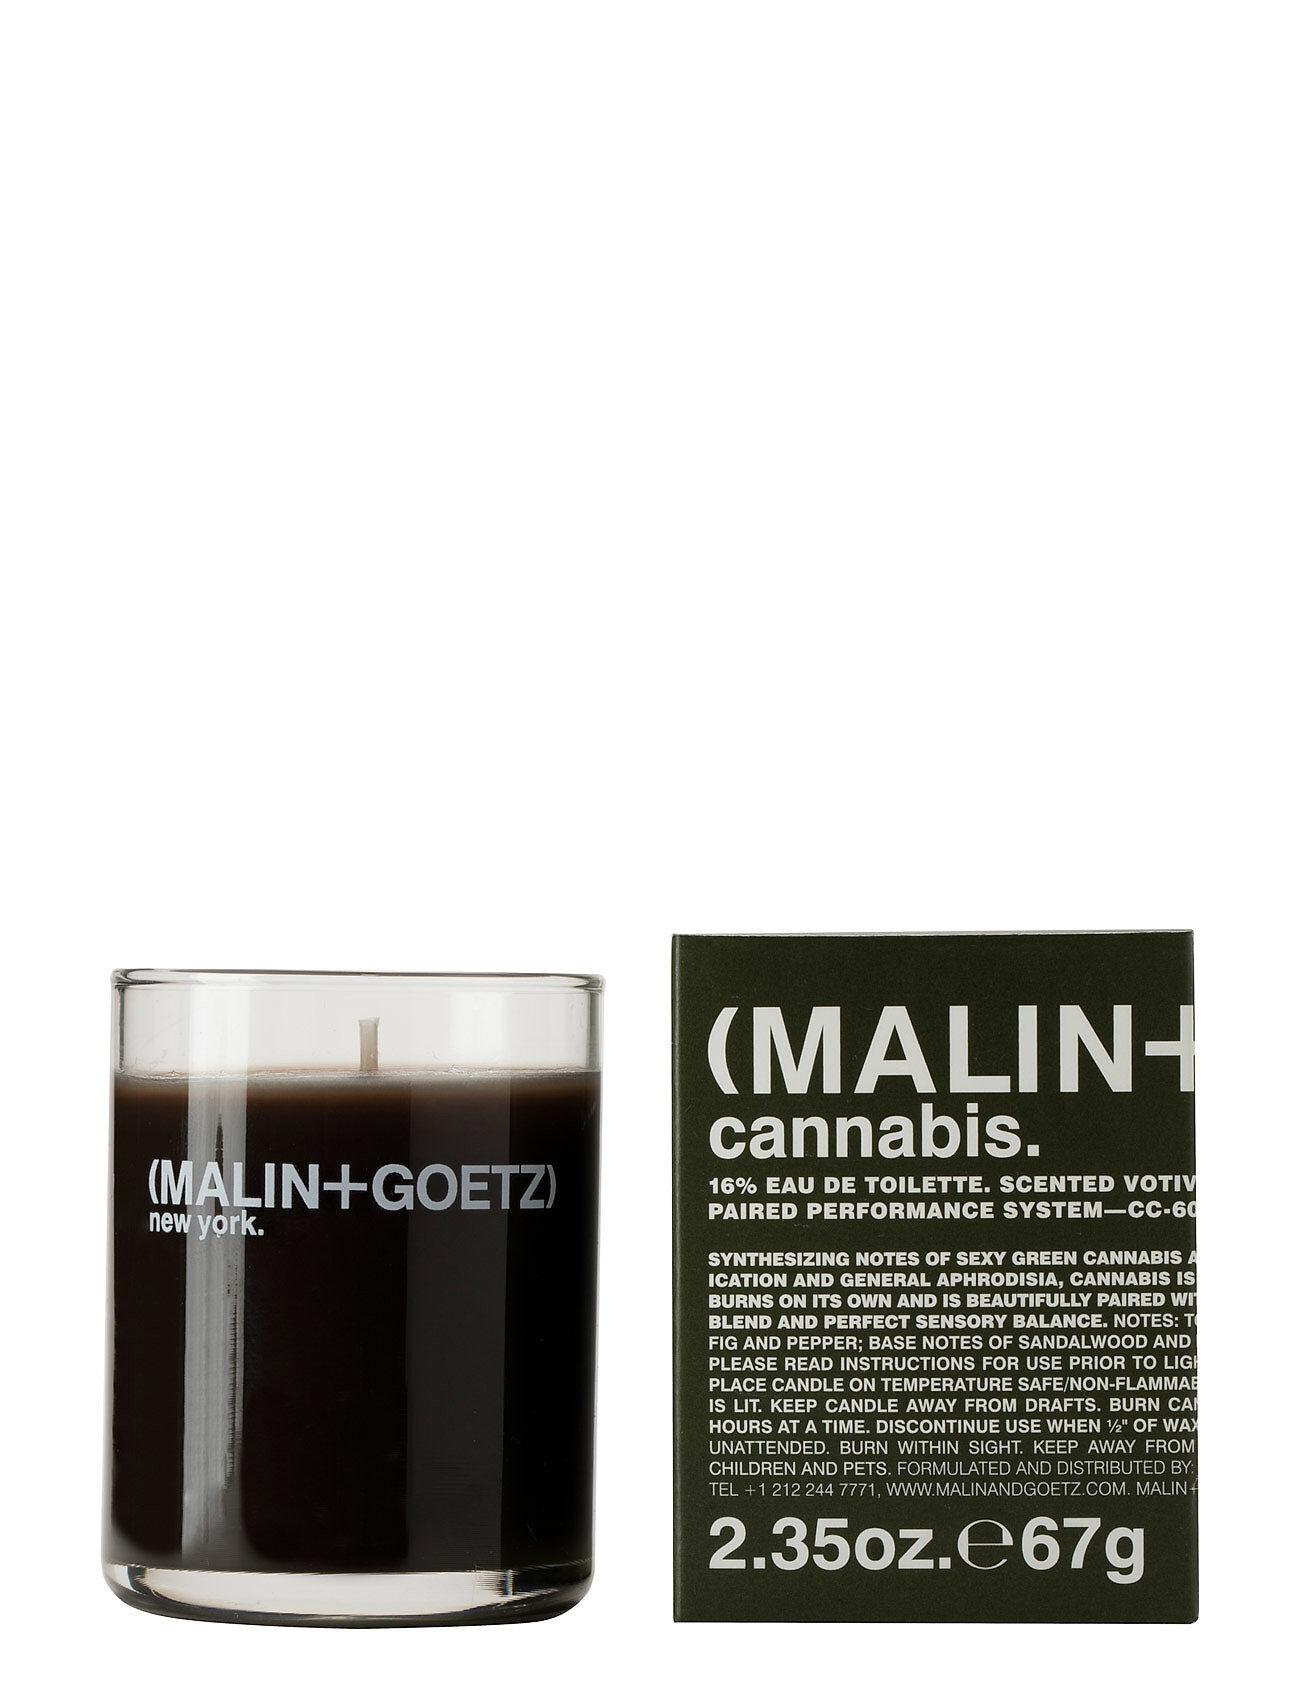 Malin+Goetz Cannabis Votive Candle